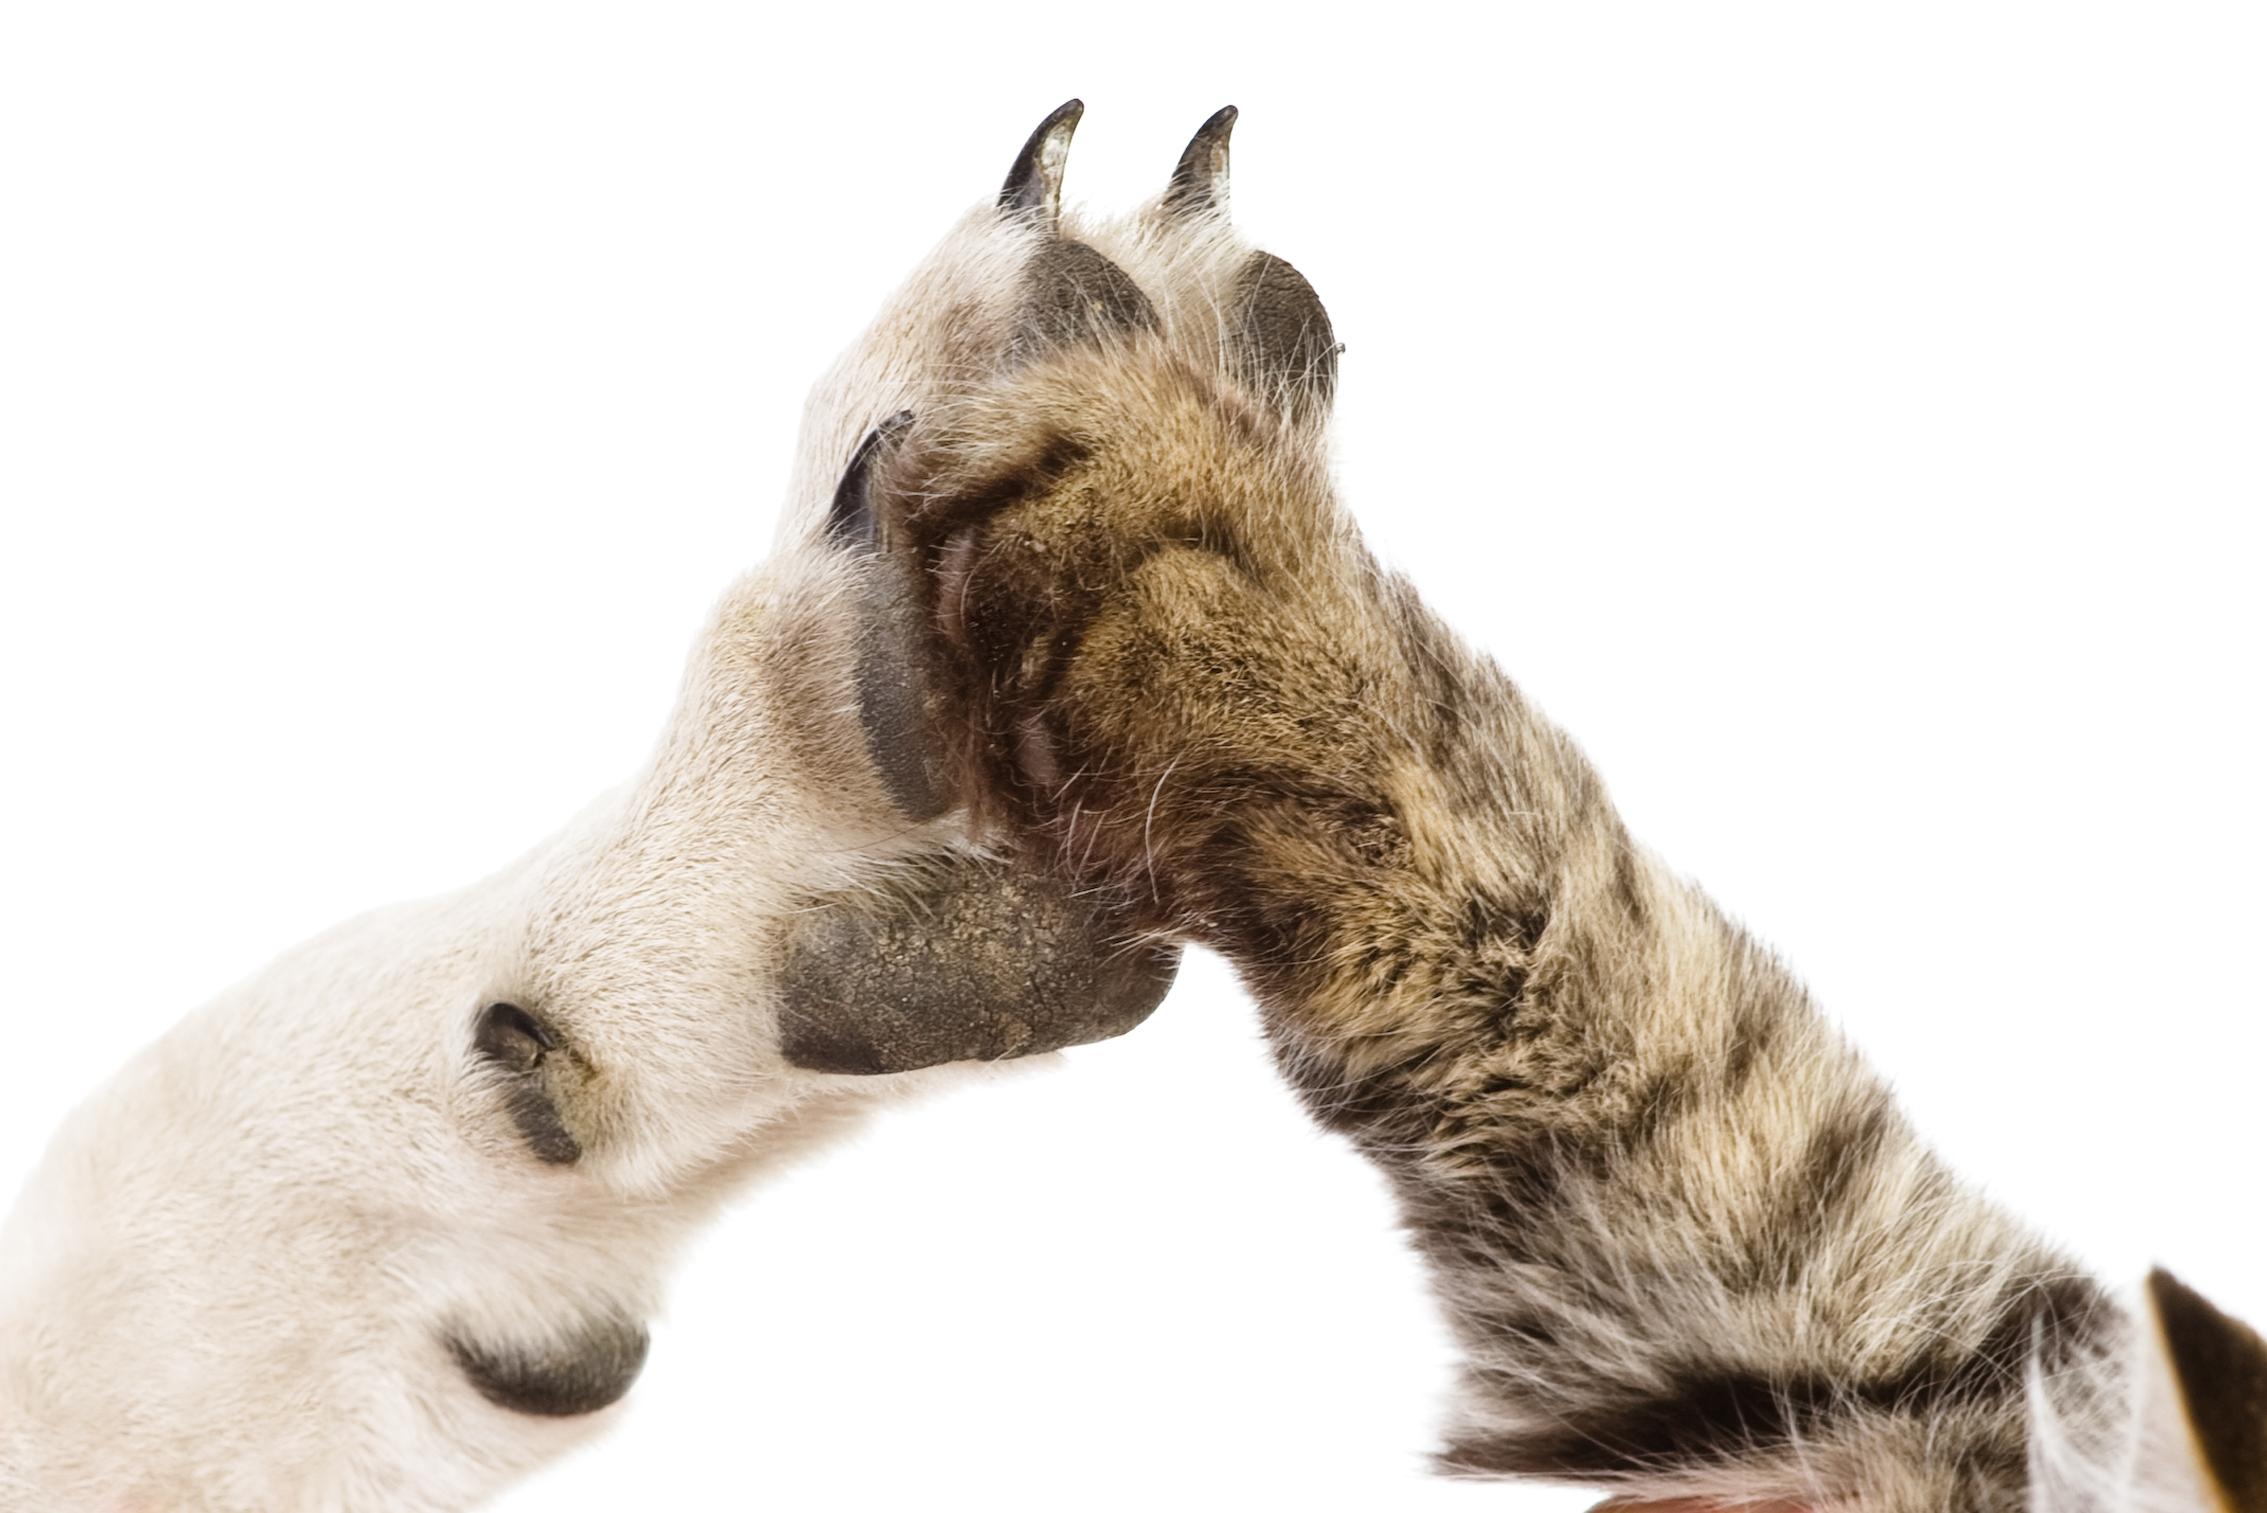 The best international dog behavior seminars for veterinarians, dog trainers, and veterinary technicians.